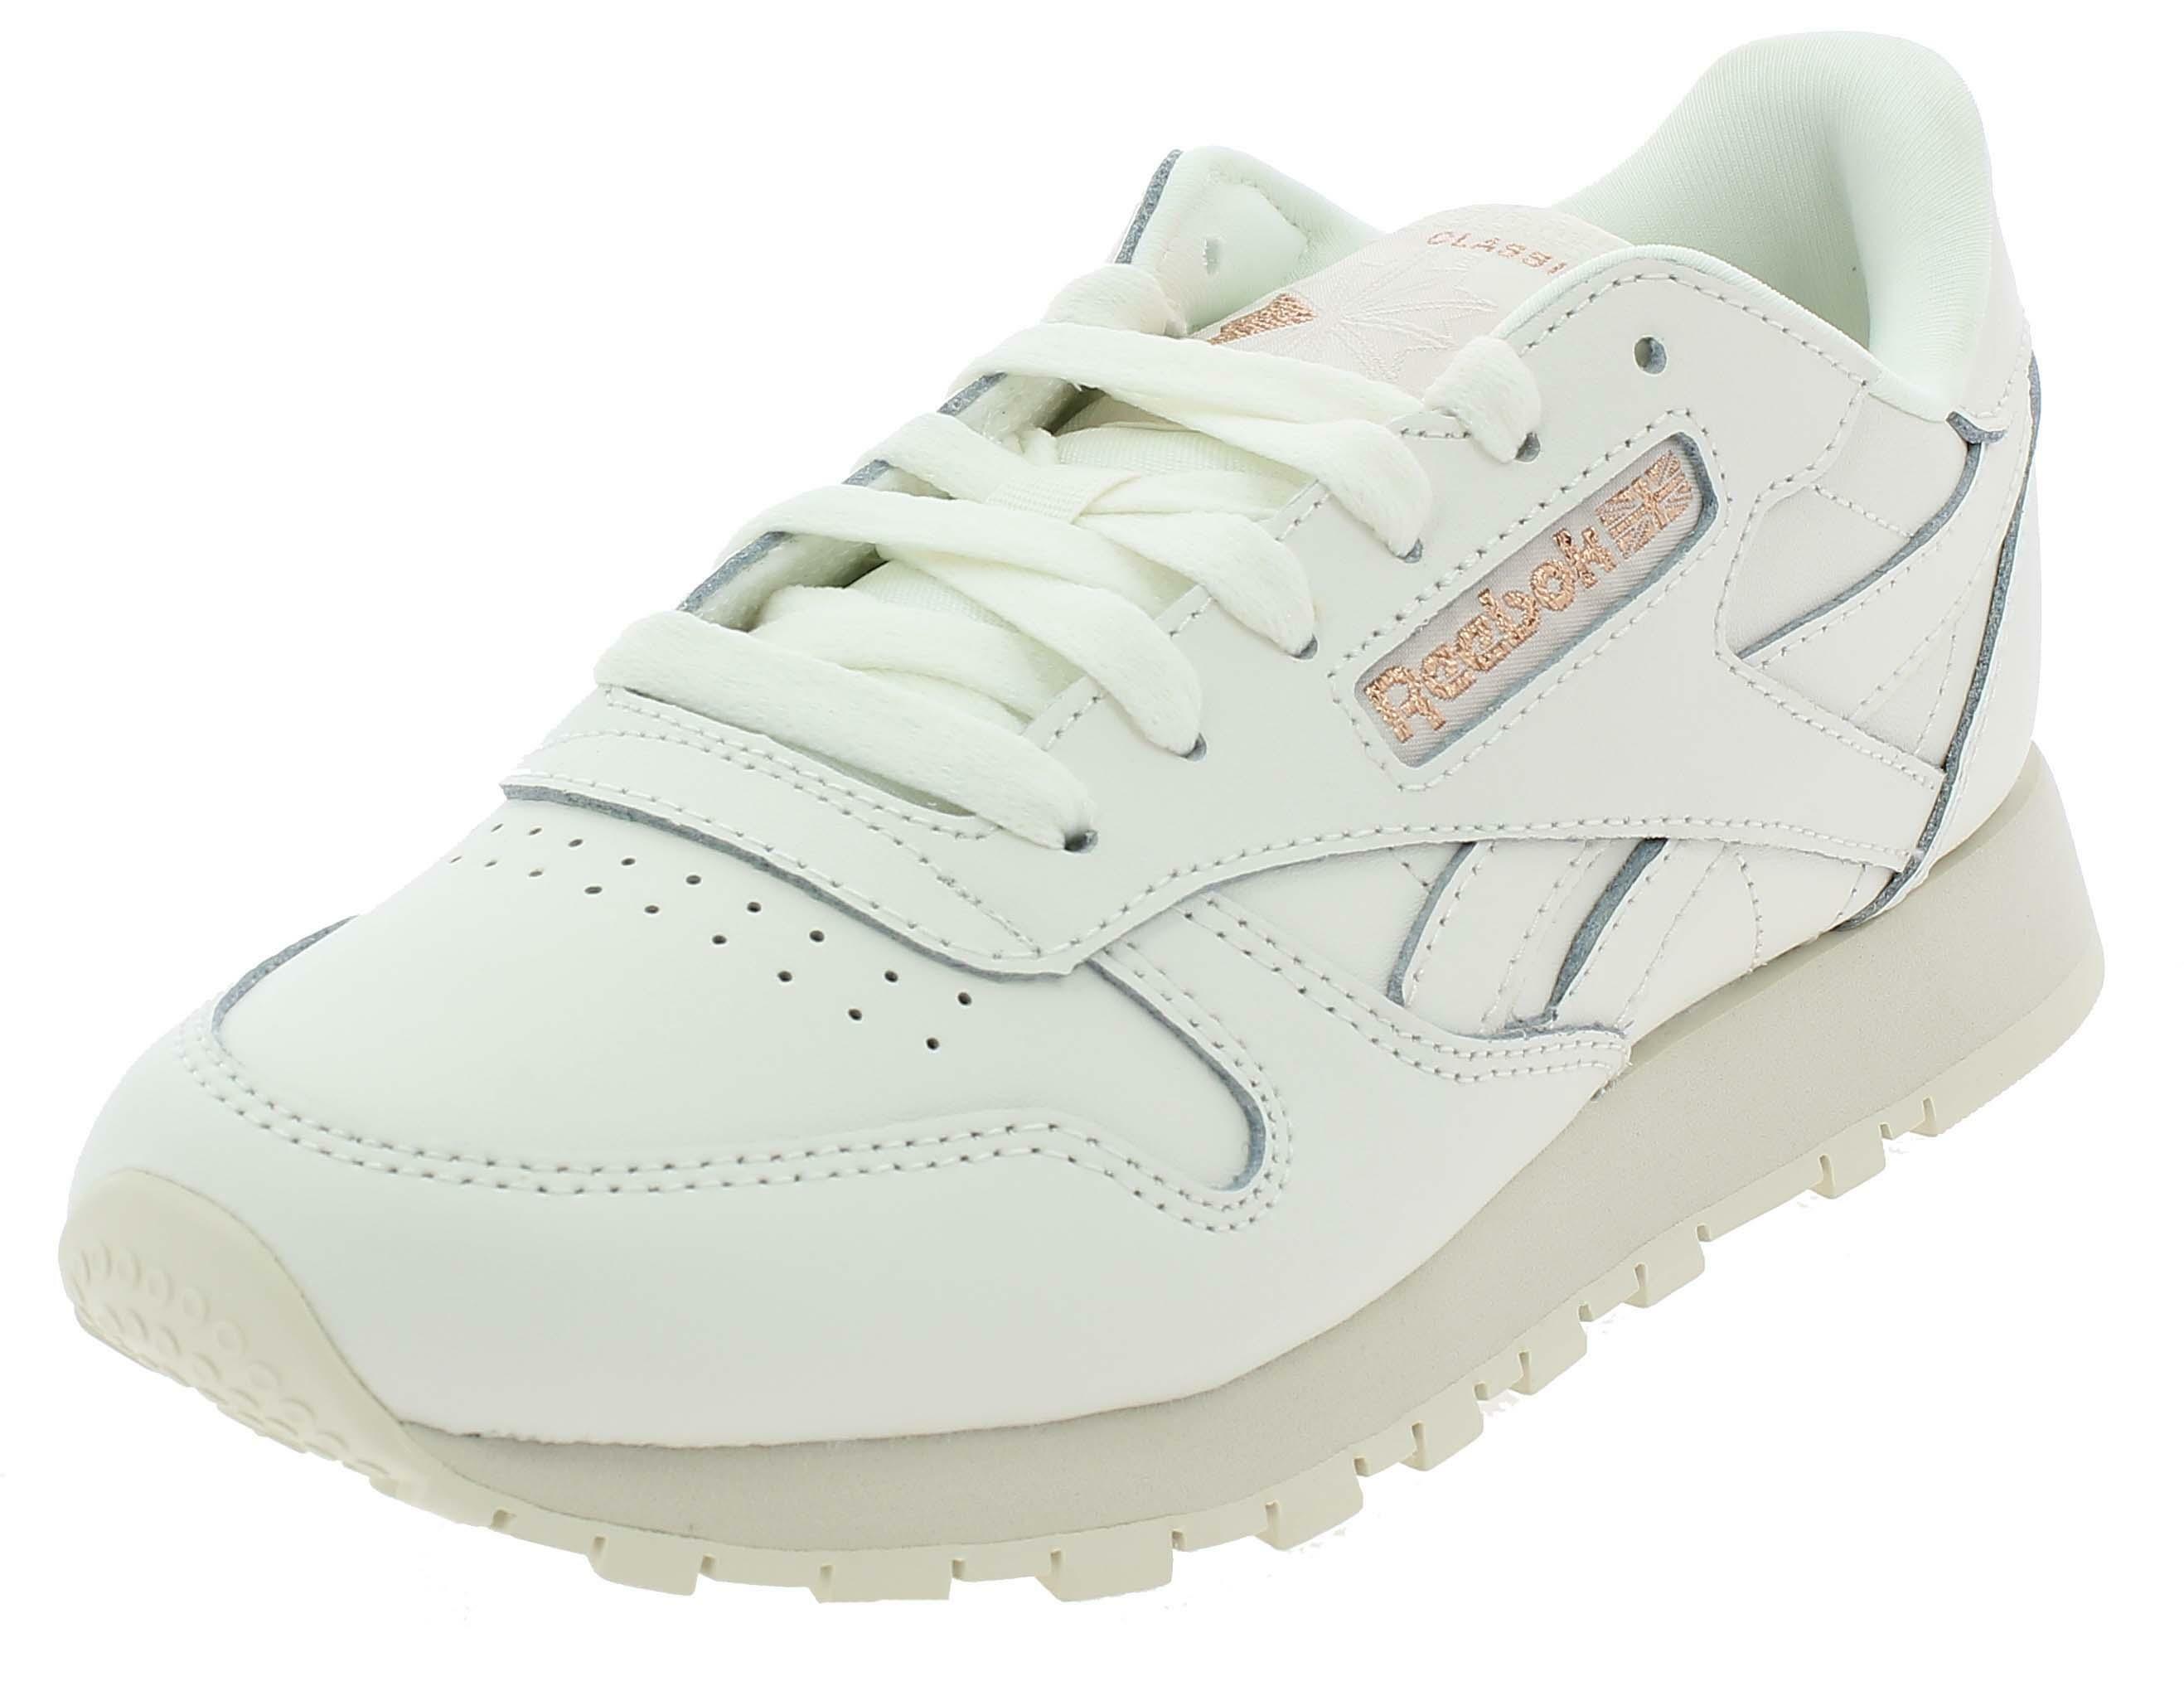 Reebok classic leather scarpe sportive donna bianche dv3762